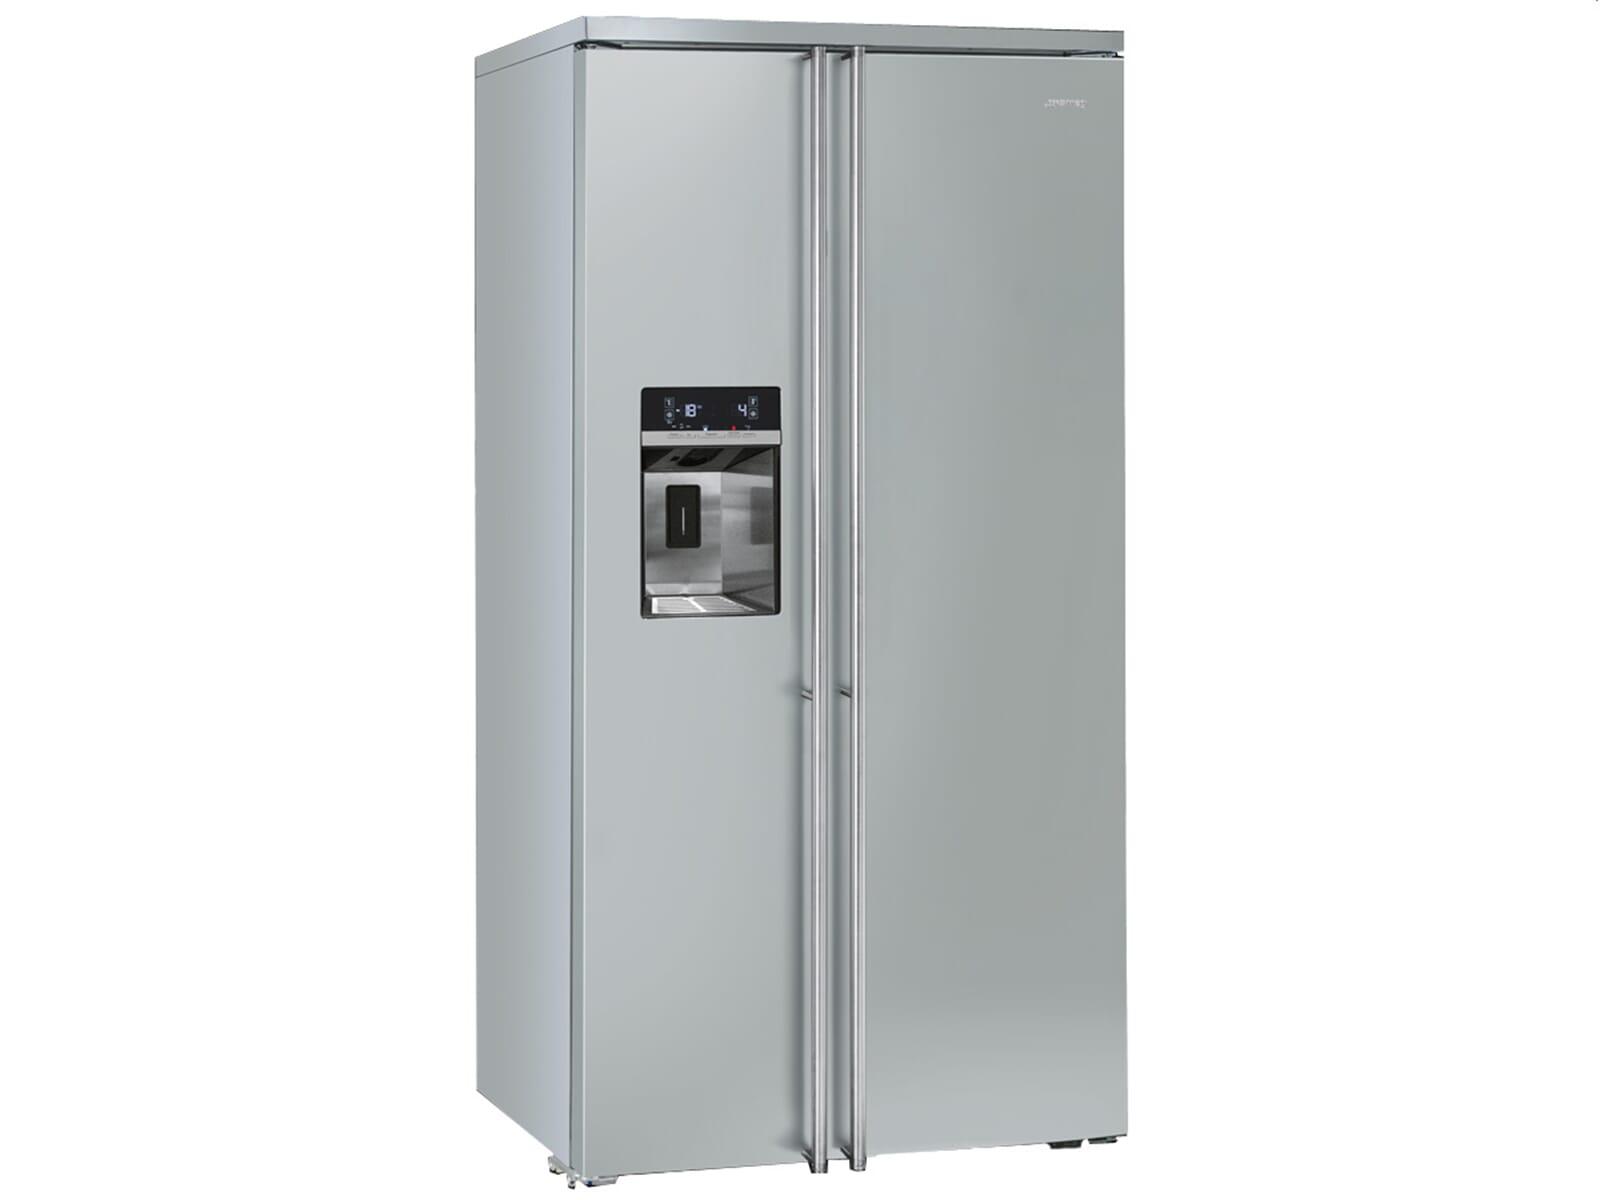 Siemens Kühlschrank 70 Cm Breit : Kühlschrank 70 cm breit kühlschrank 45 cm breit frisch liebherr